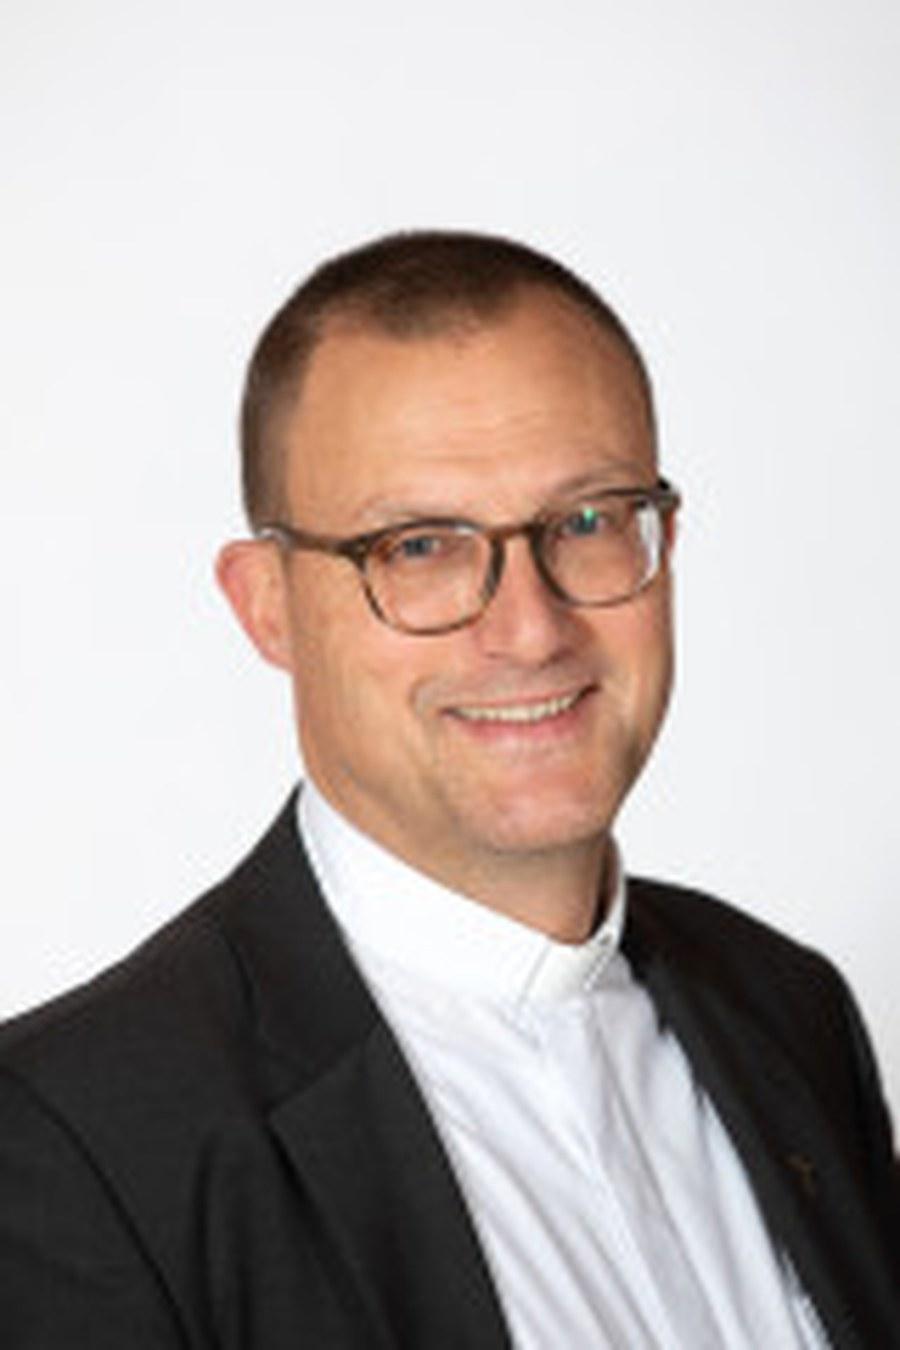 Andreas Rellstab, Pfarrer in Zürich